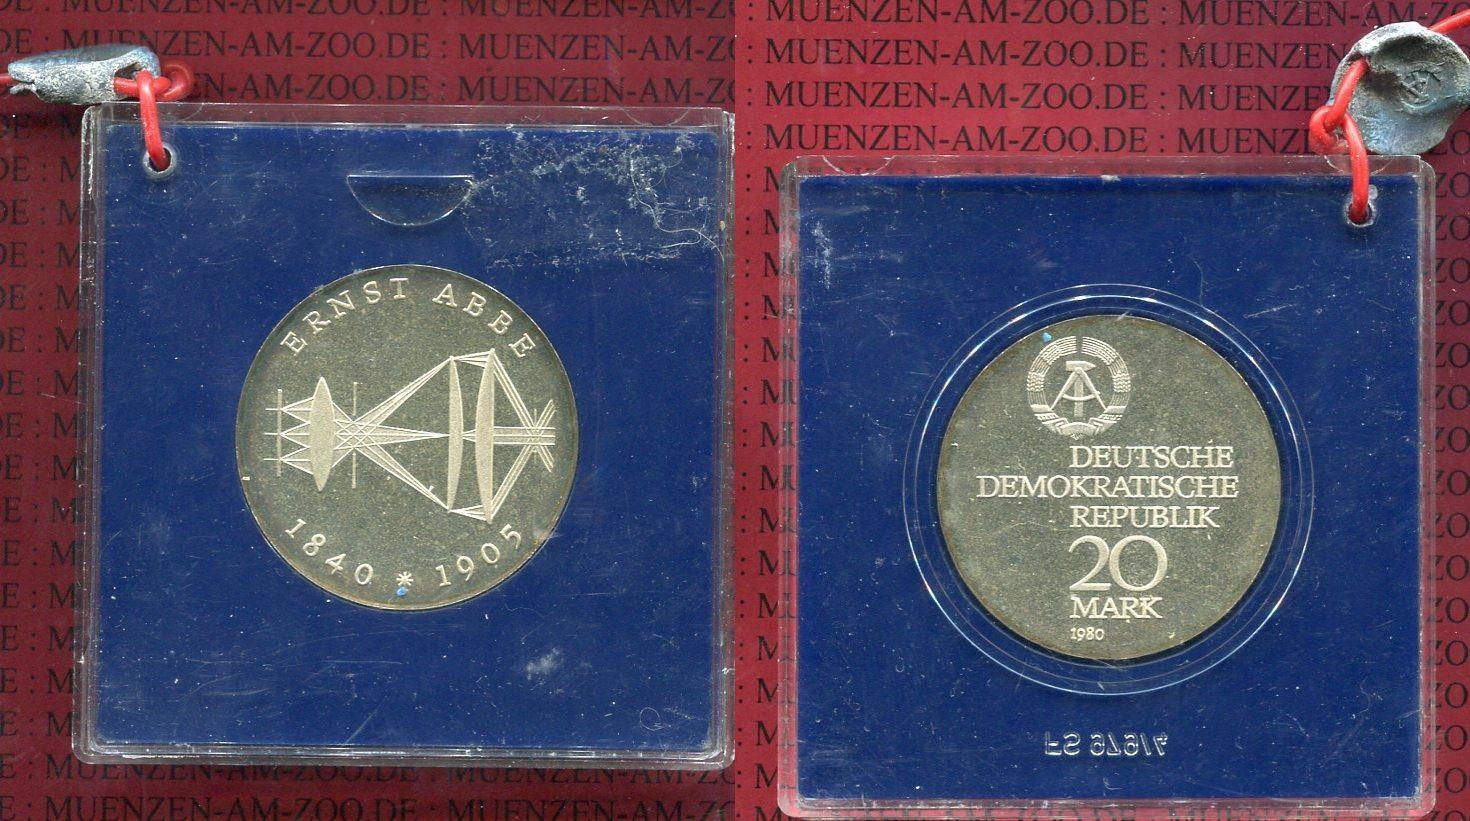 20 Mark 1980 DDR DDR 20 Mark 1980 A Silber, Ernst Abbe, Polierte Platte Polierte Platte* verplombt